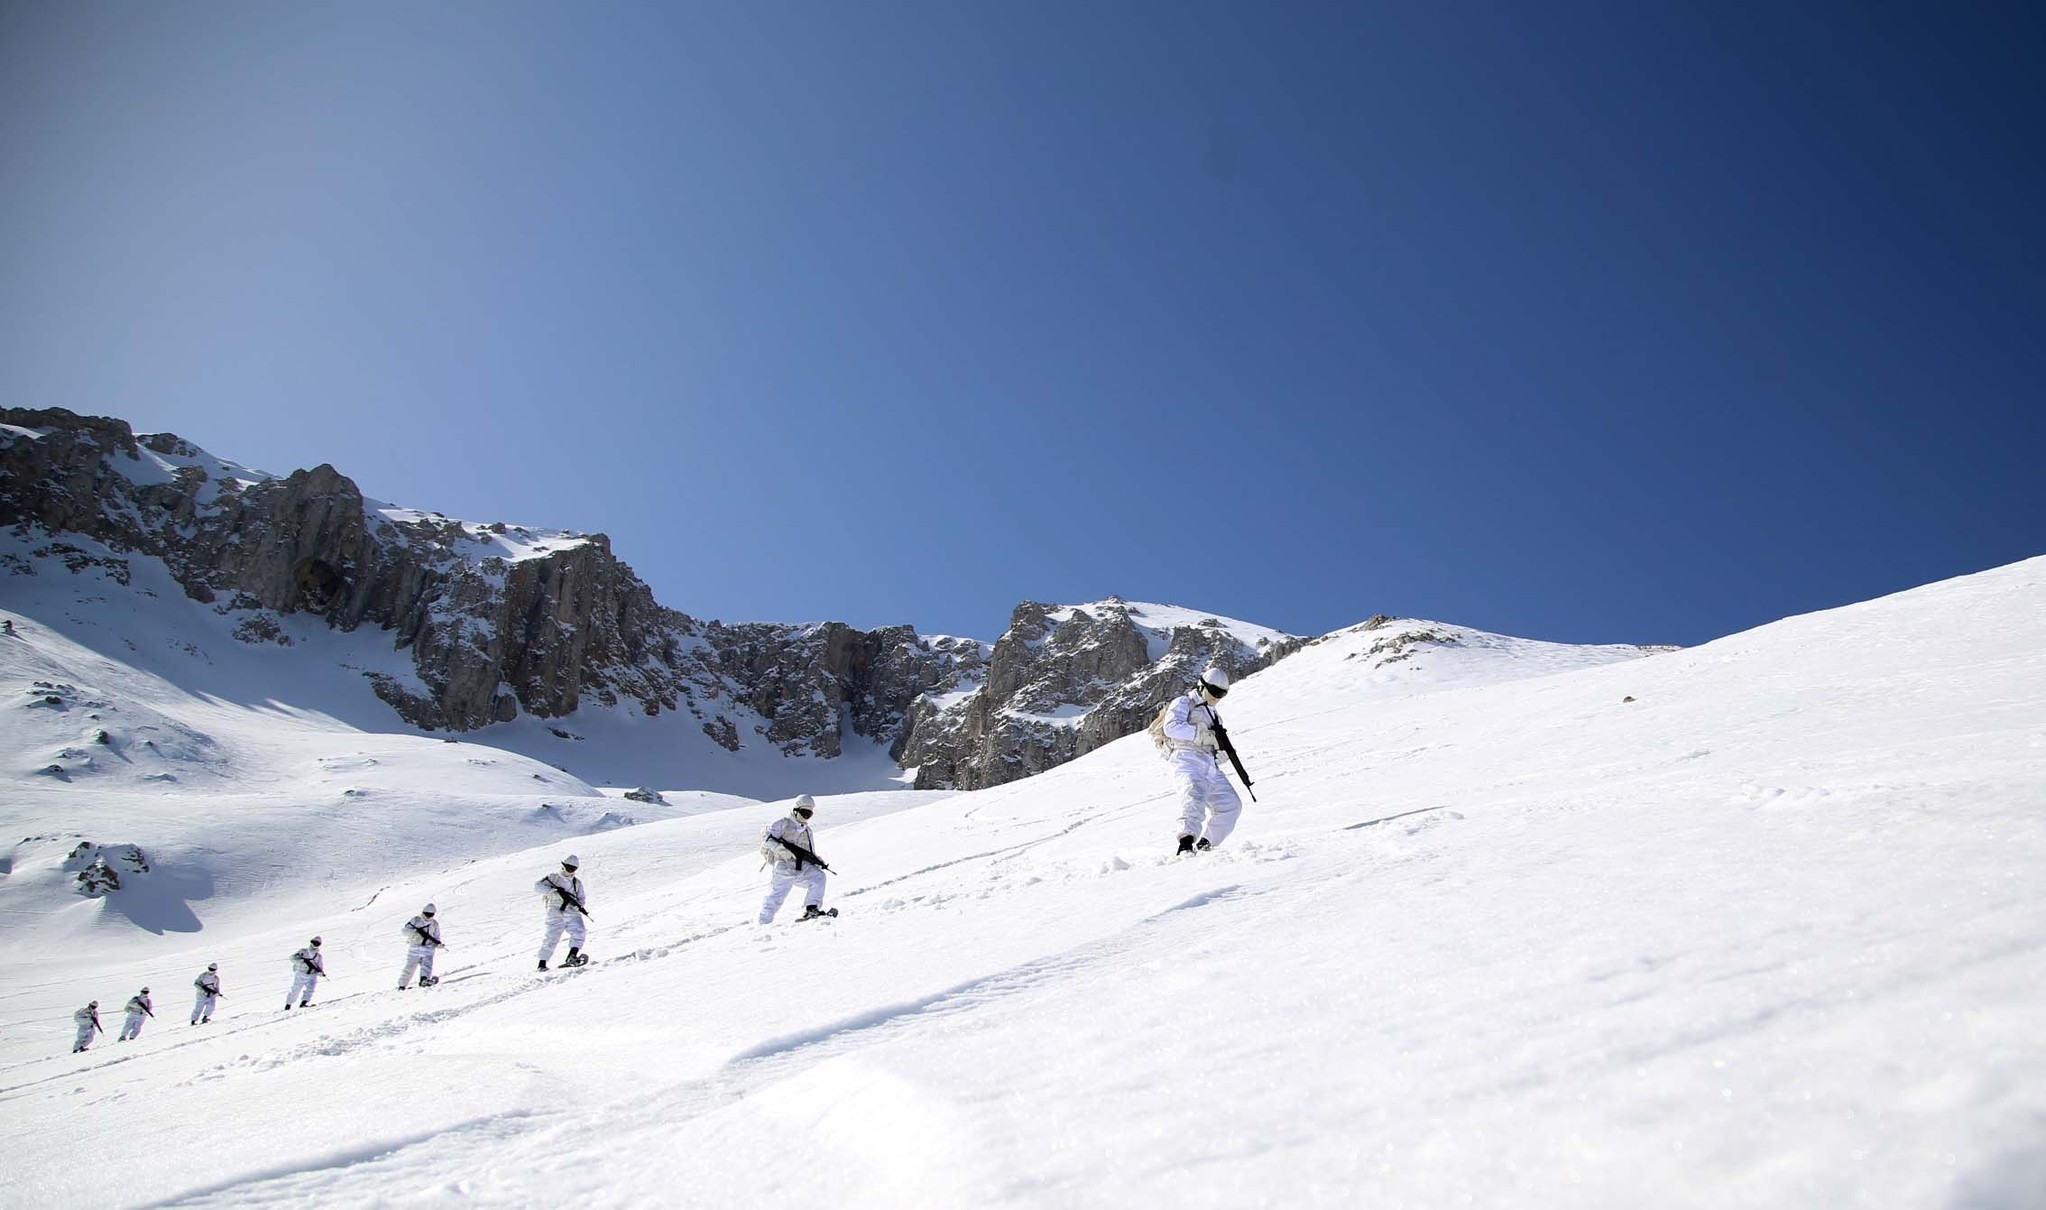 Prospective commandos walk in single file on a snowy slope.